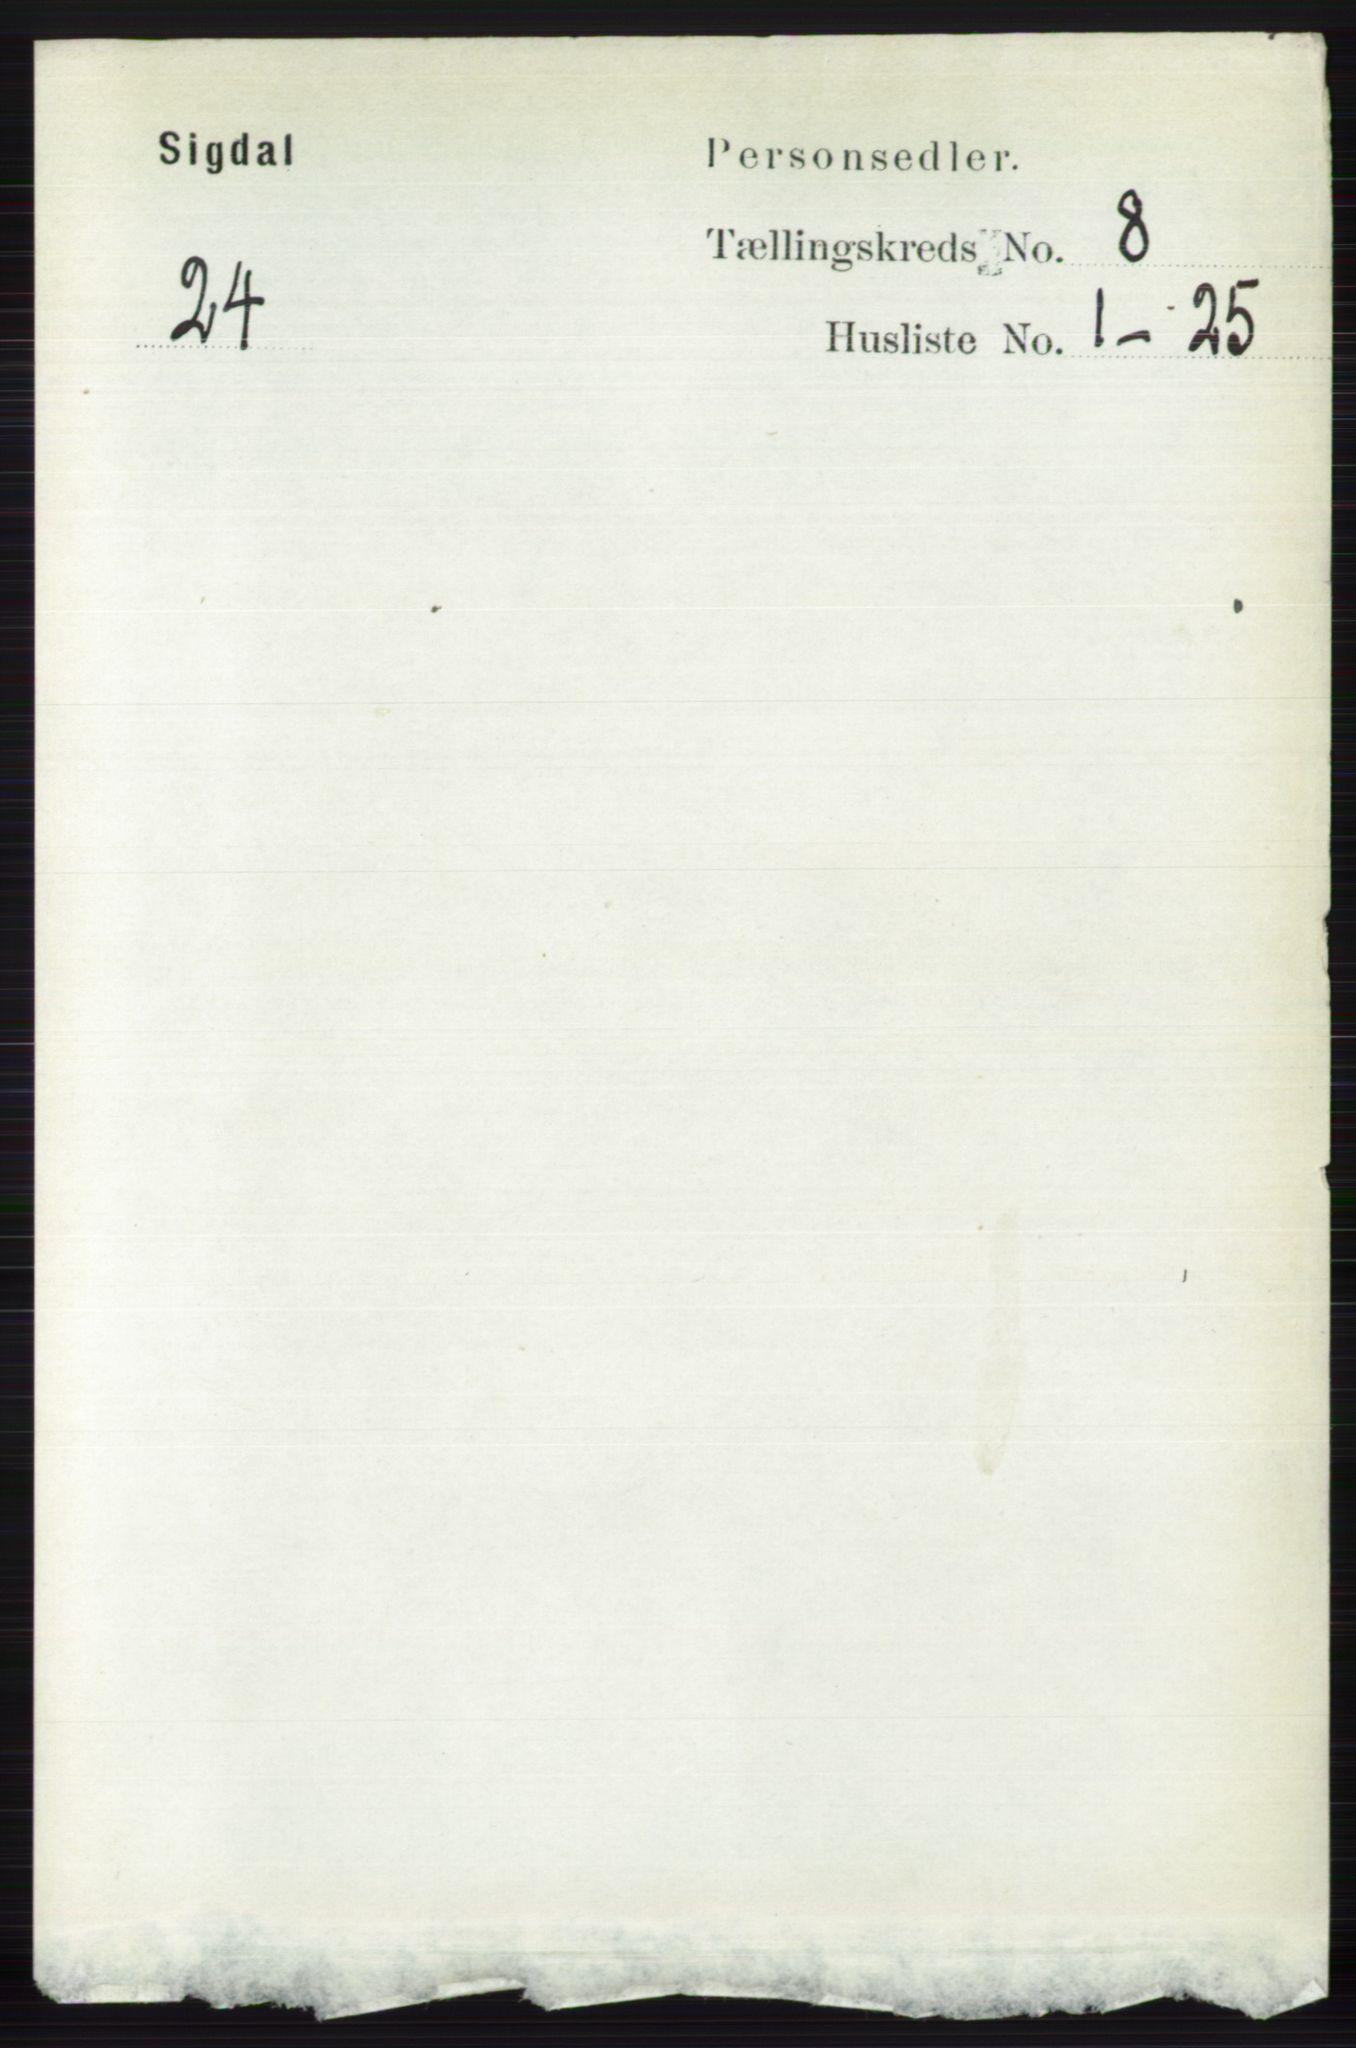 RA, Folketelling 1891 for 0621 Sigdal herred, 1891, s. 3176